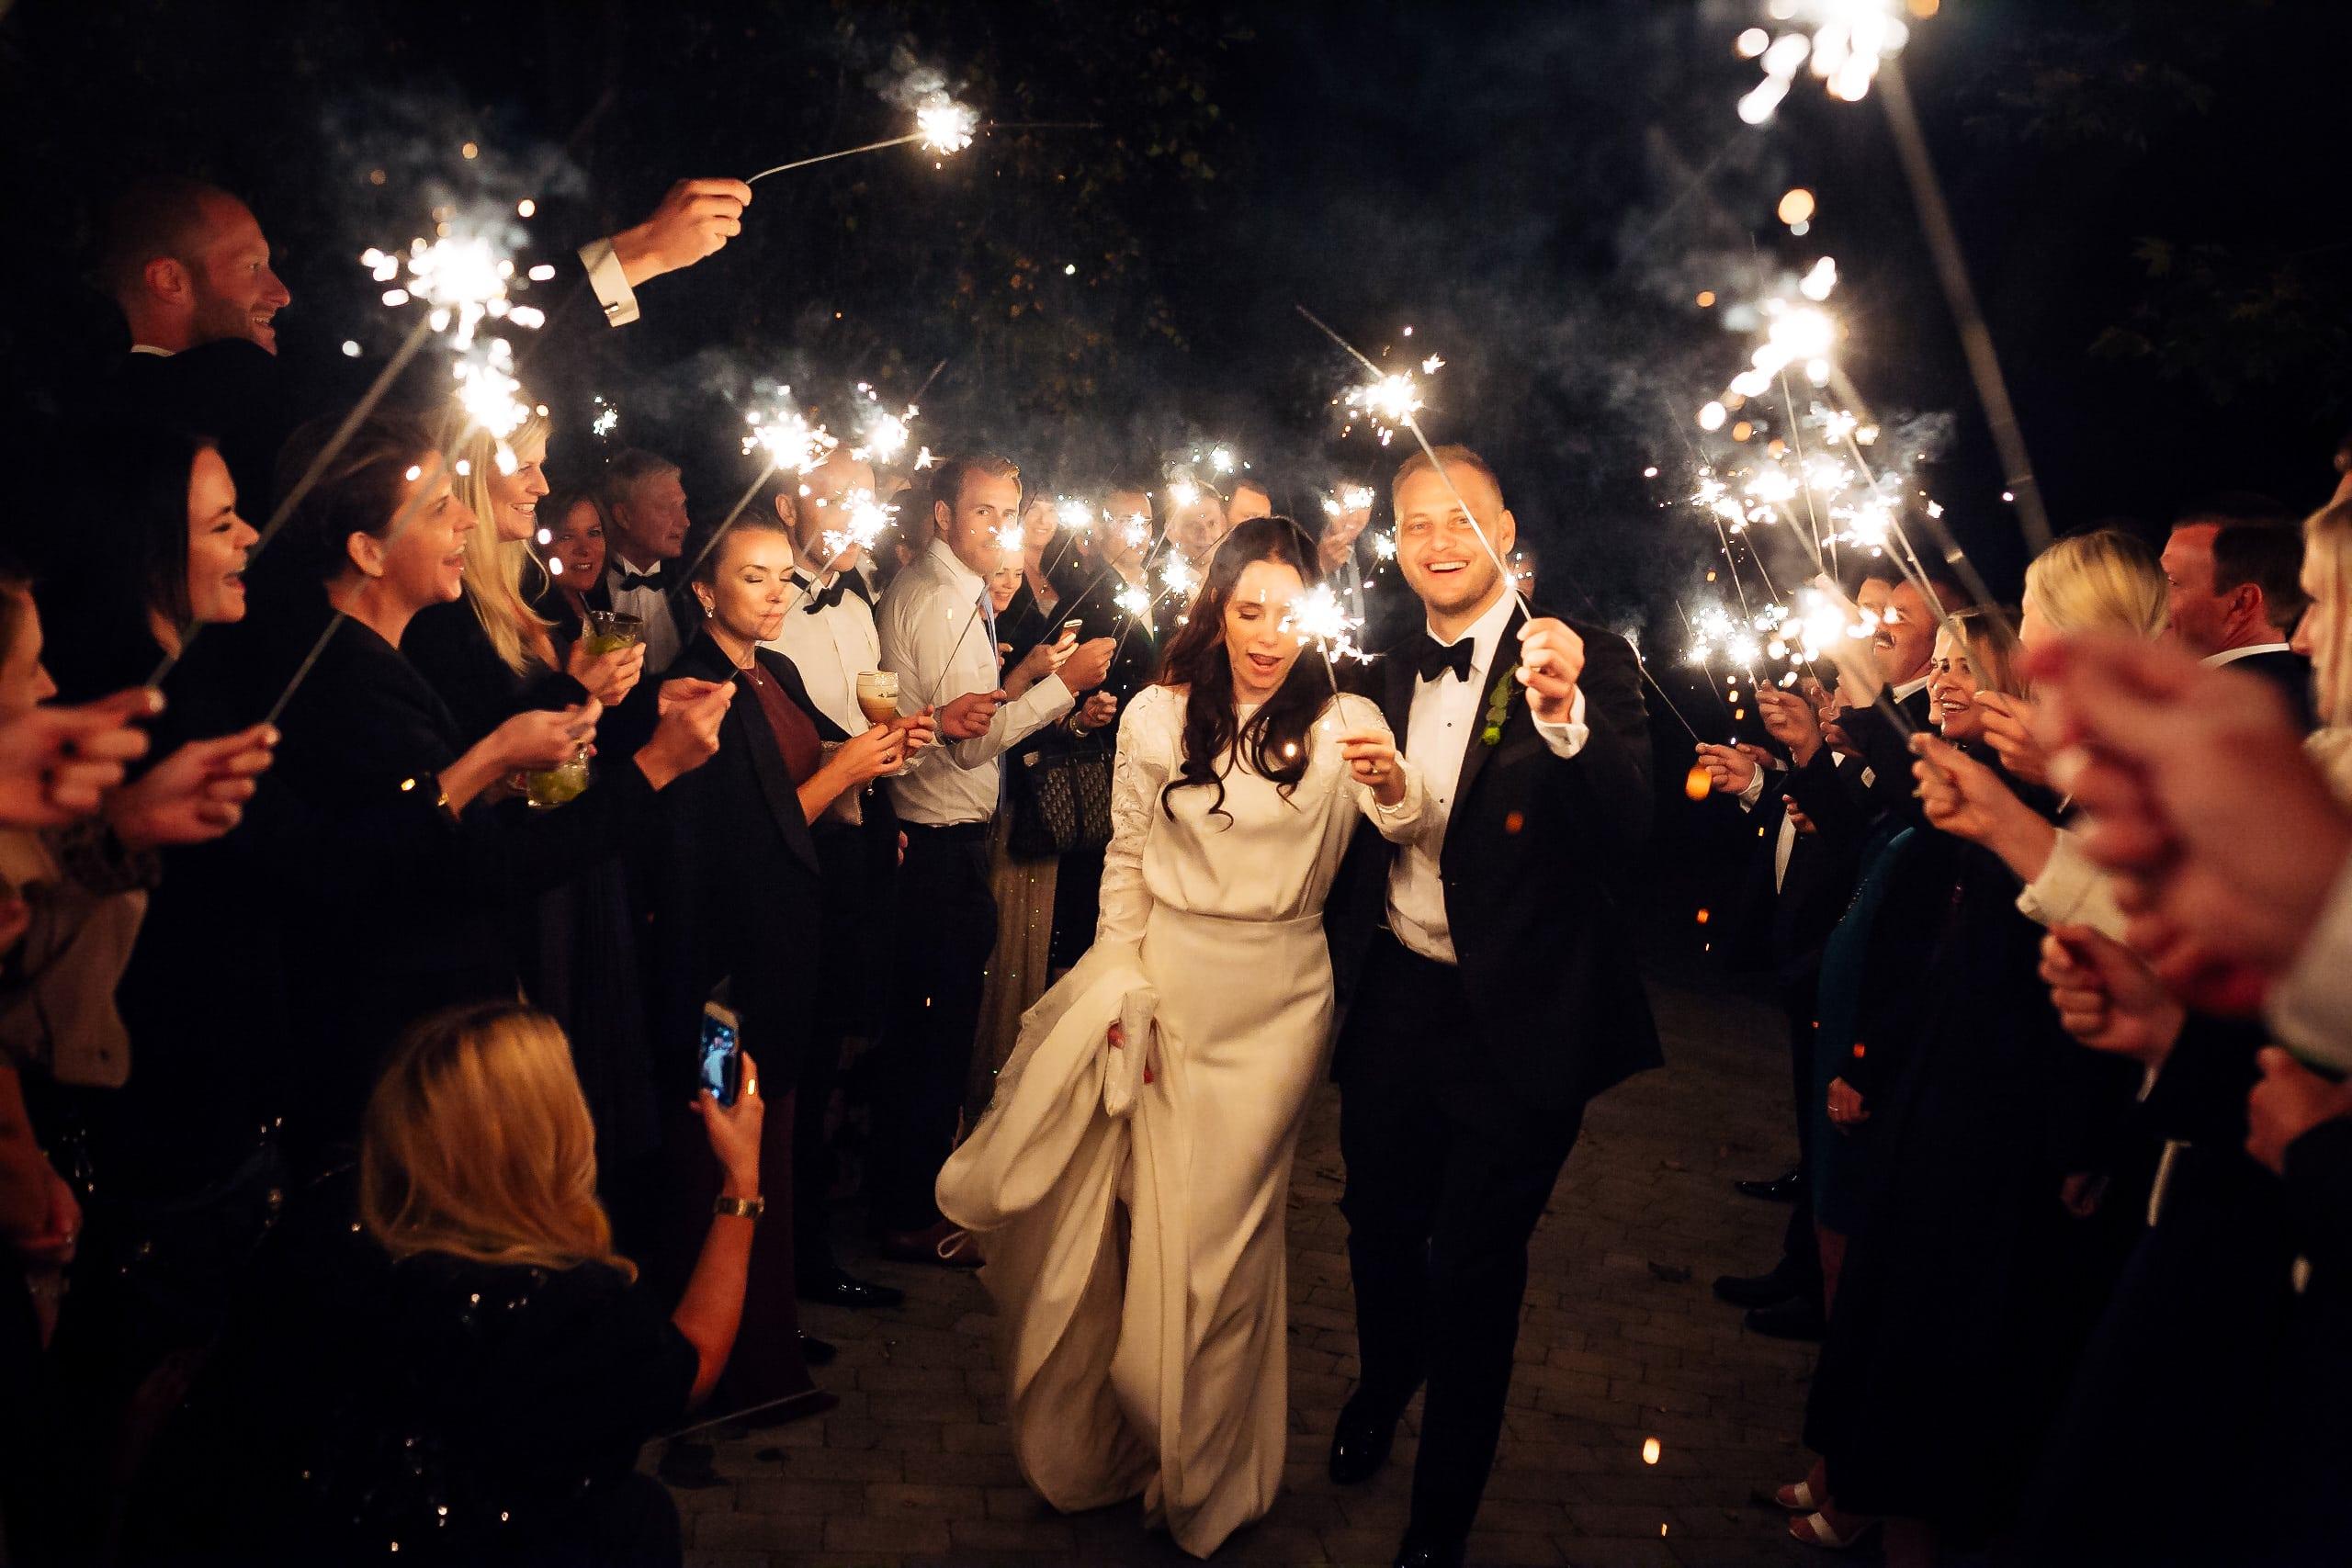 En bryllupsdag bryllup stjerneskudd